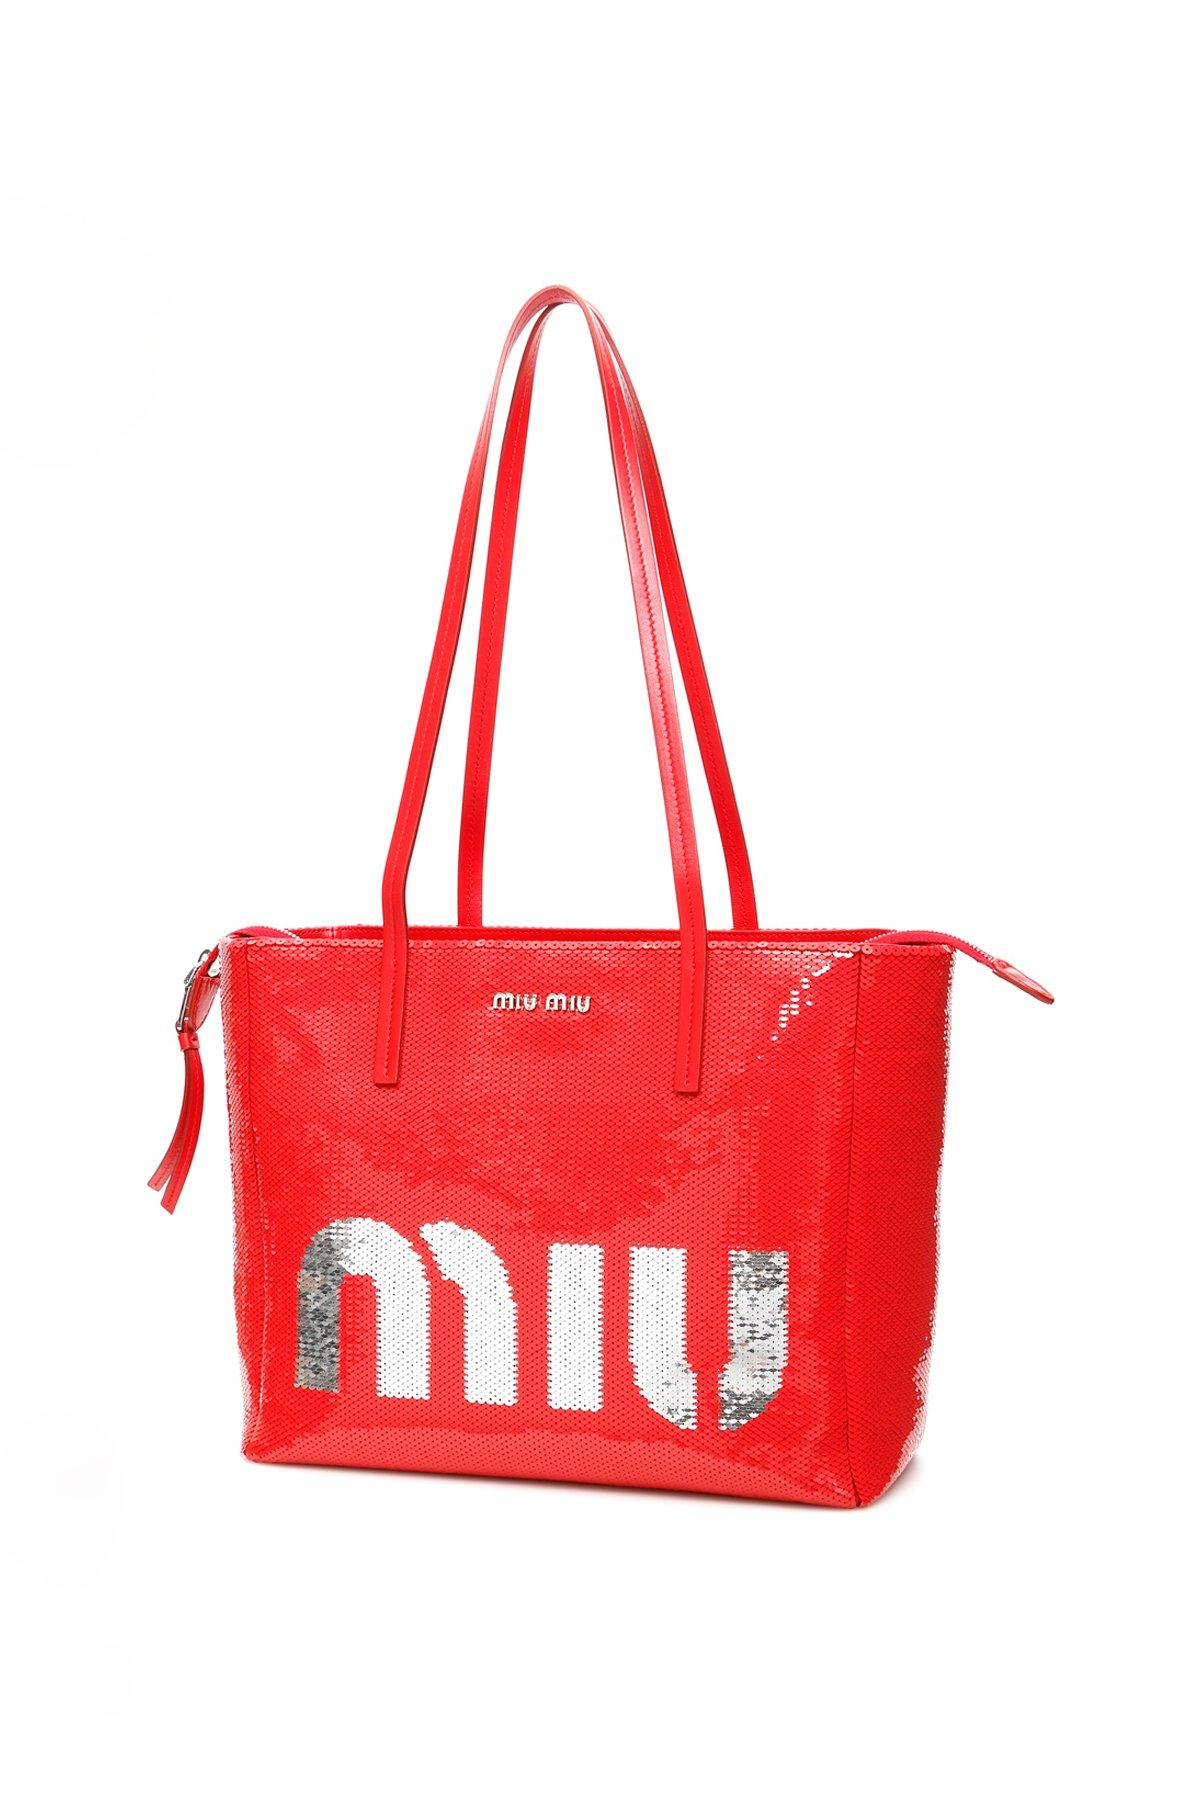 d89d514cd763 Lyst - Miu Miu Logo Print Tote in Red - Save 28%